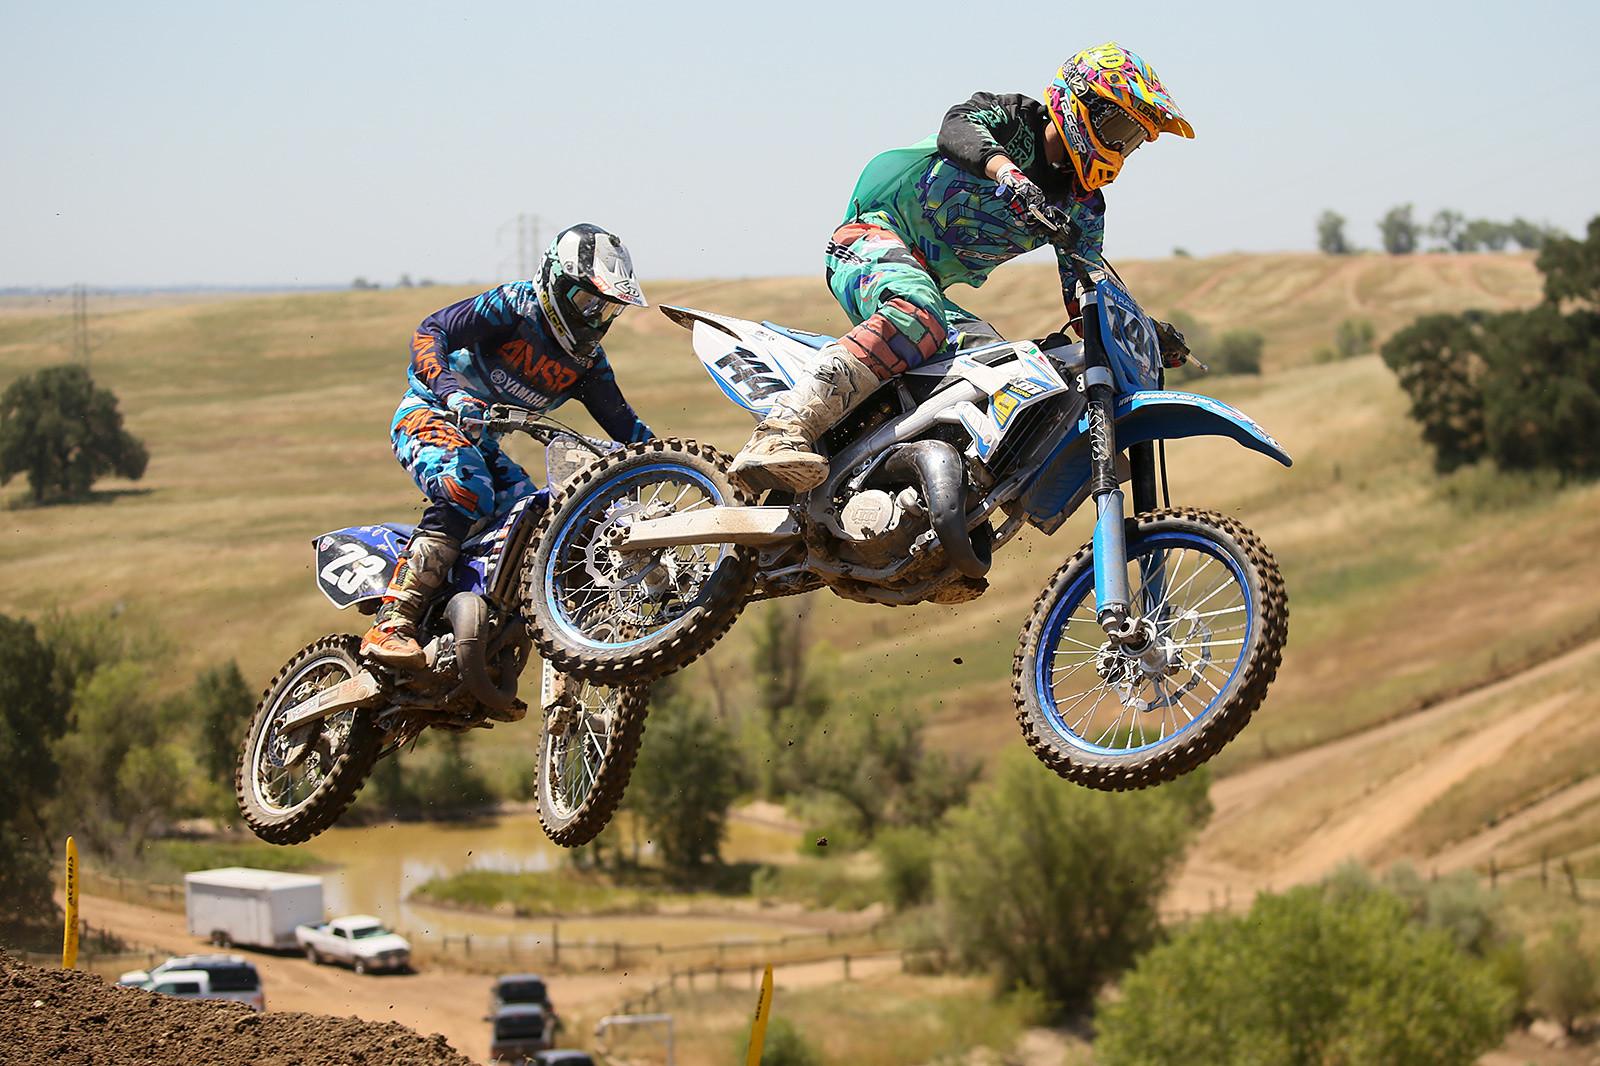 Cobe Lehnertz and Chris Plouffe  - Vital MX Pit Bits: Hangtown - Motocross Pictures - Vital MX